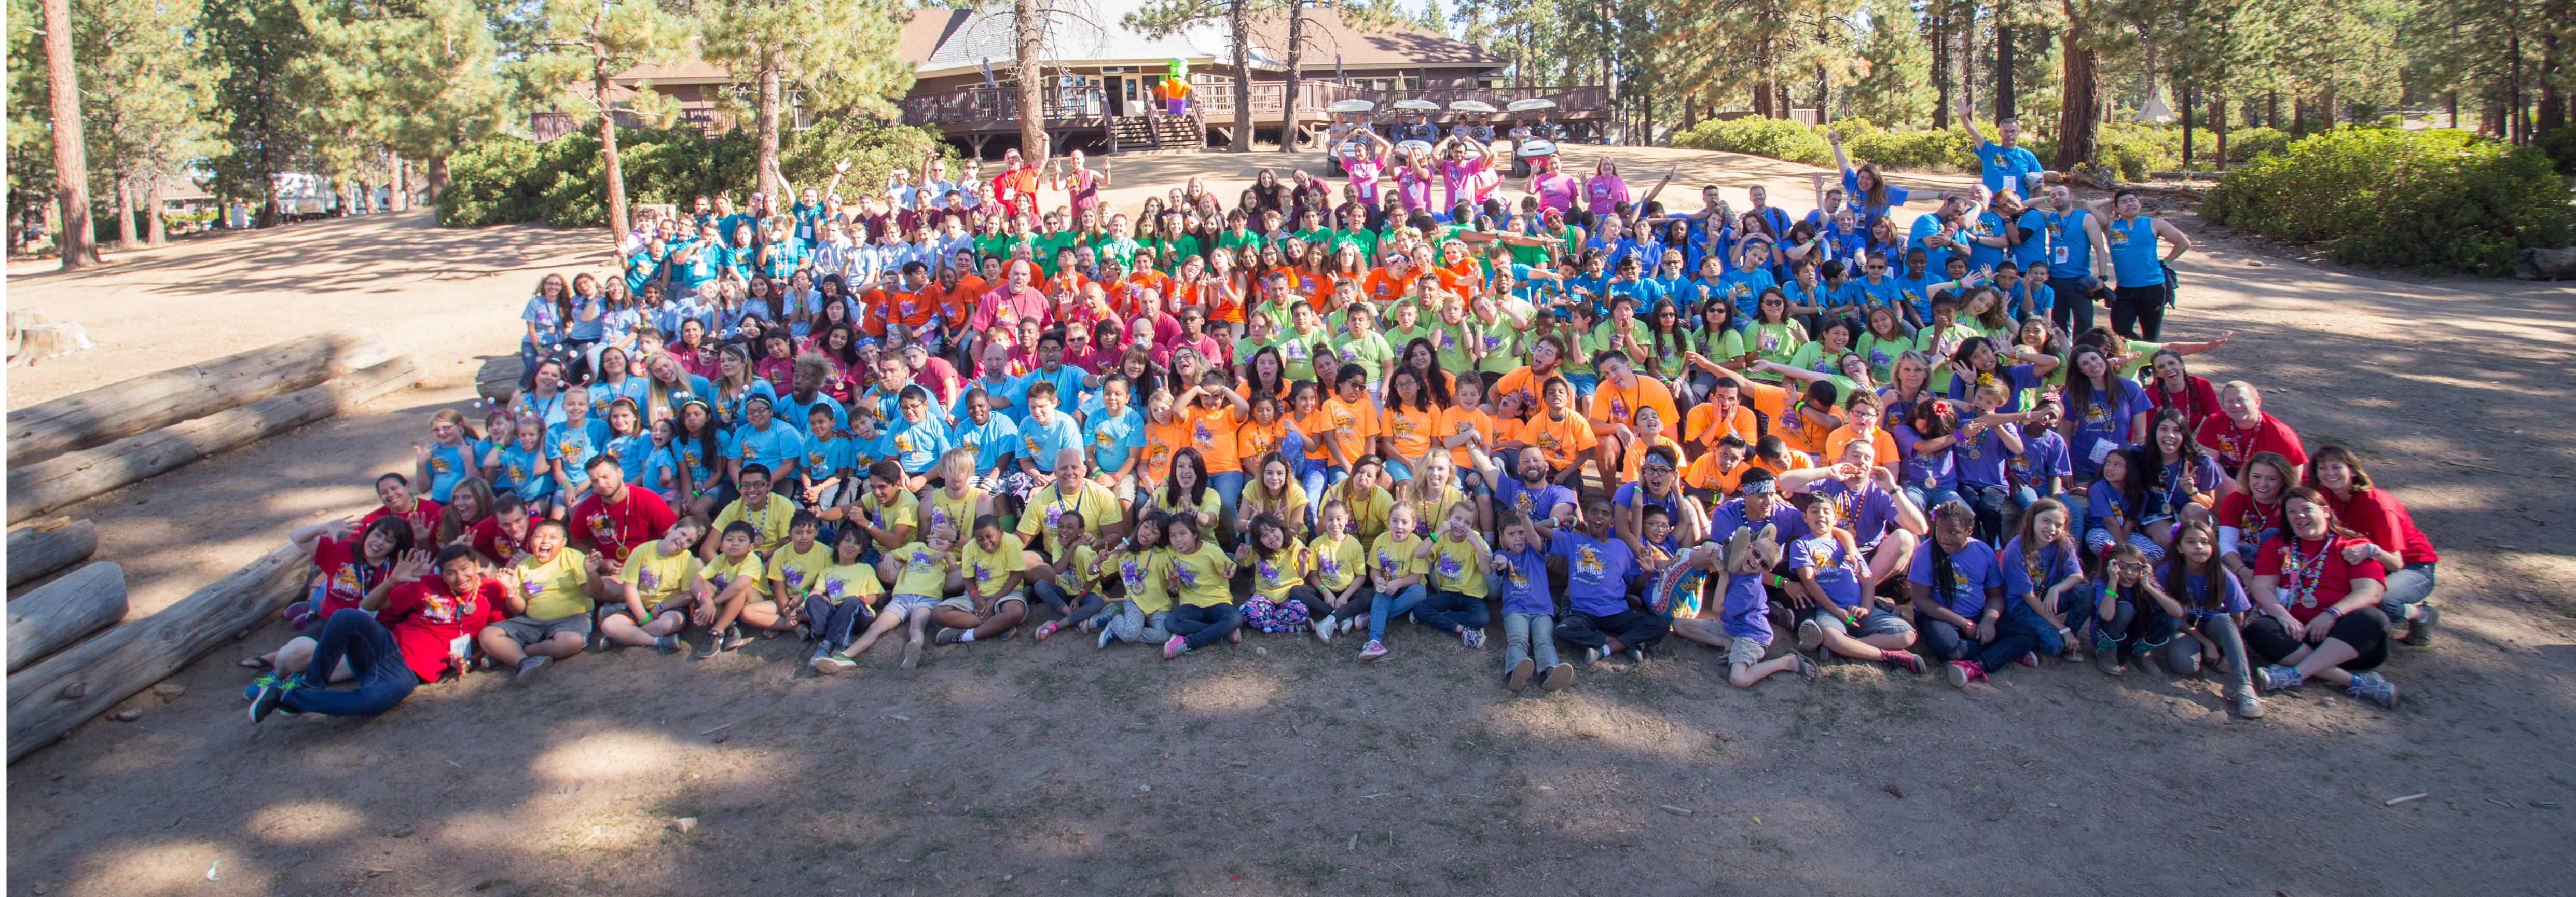 Camp Independent Firefly Volunteers Needed